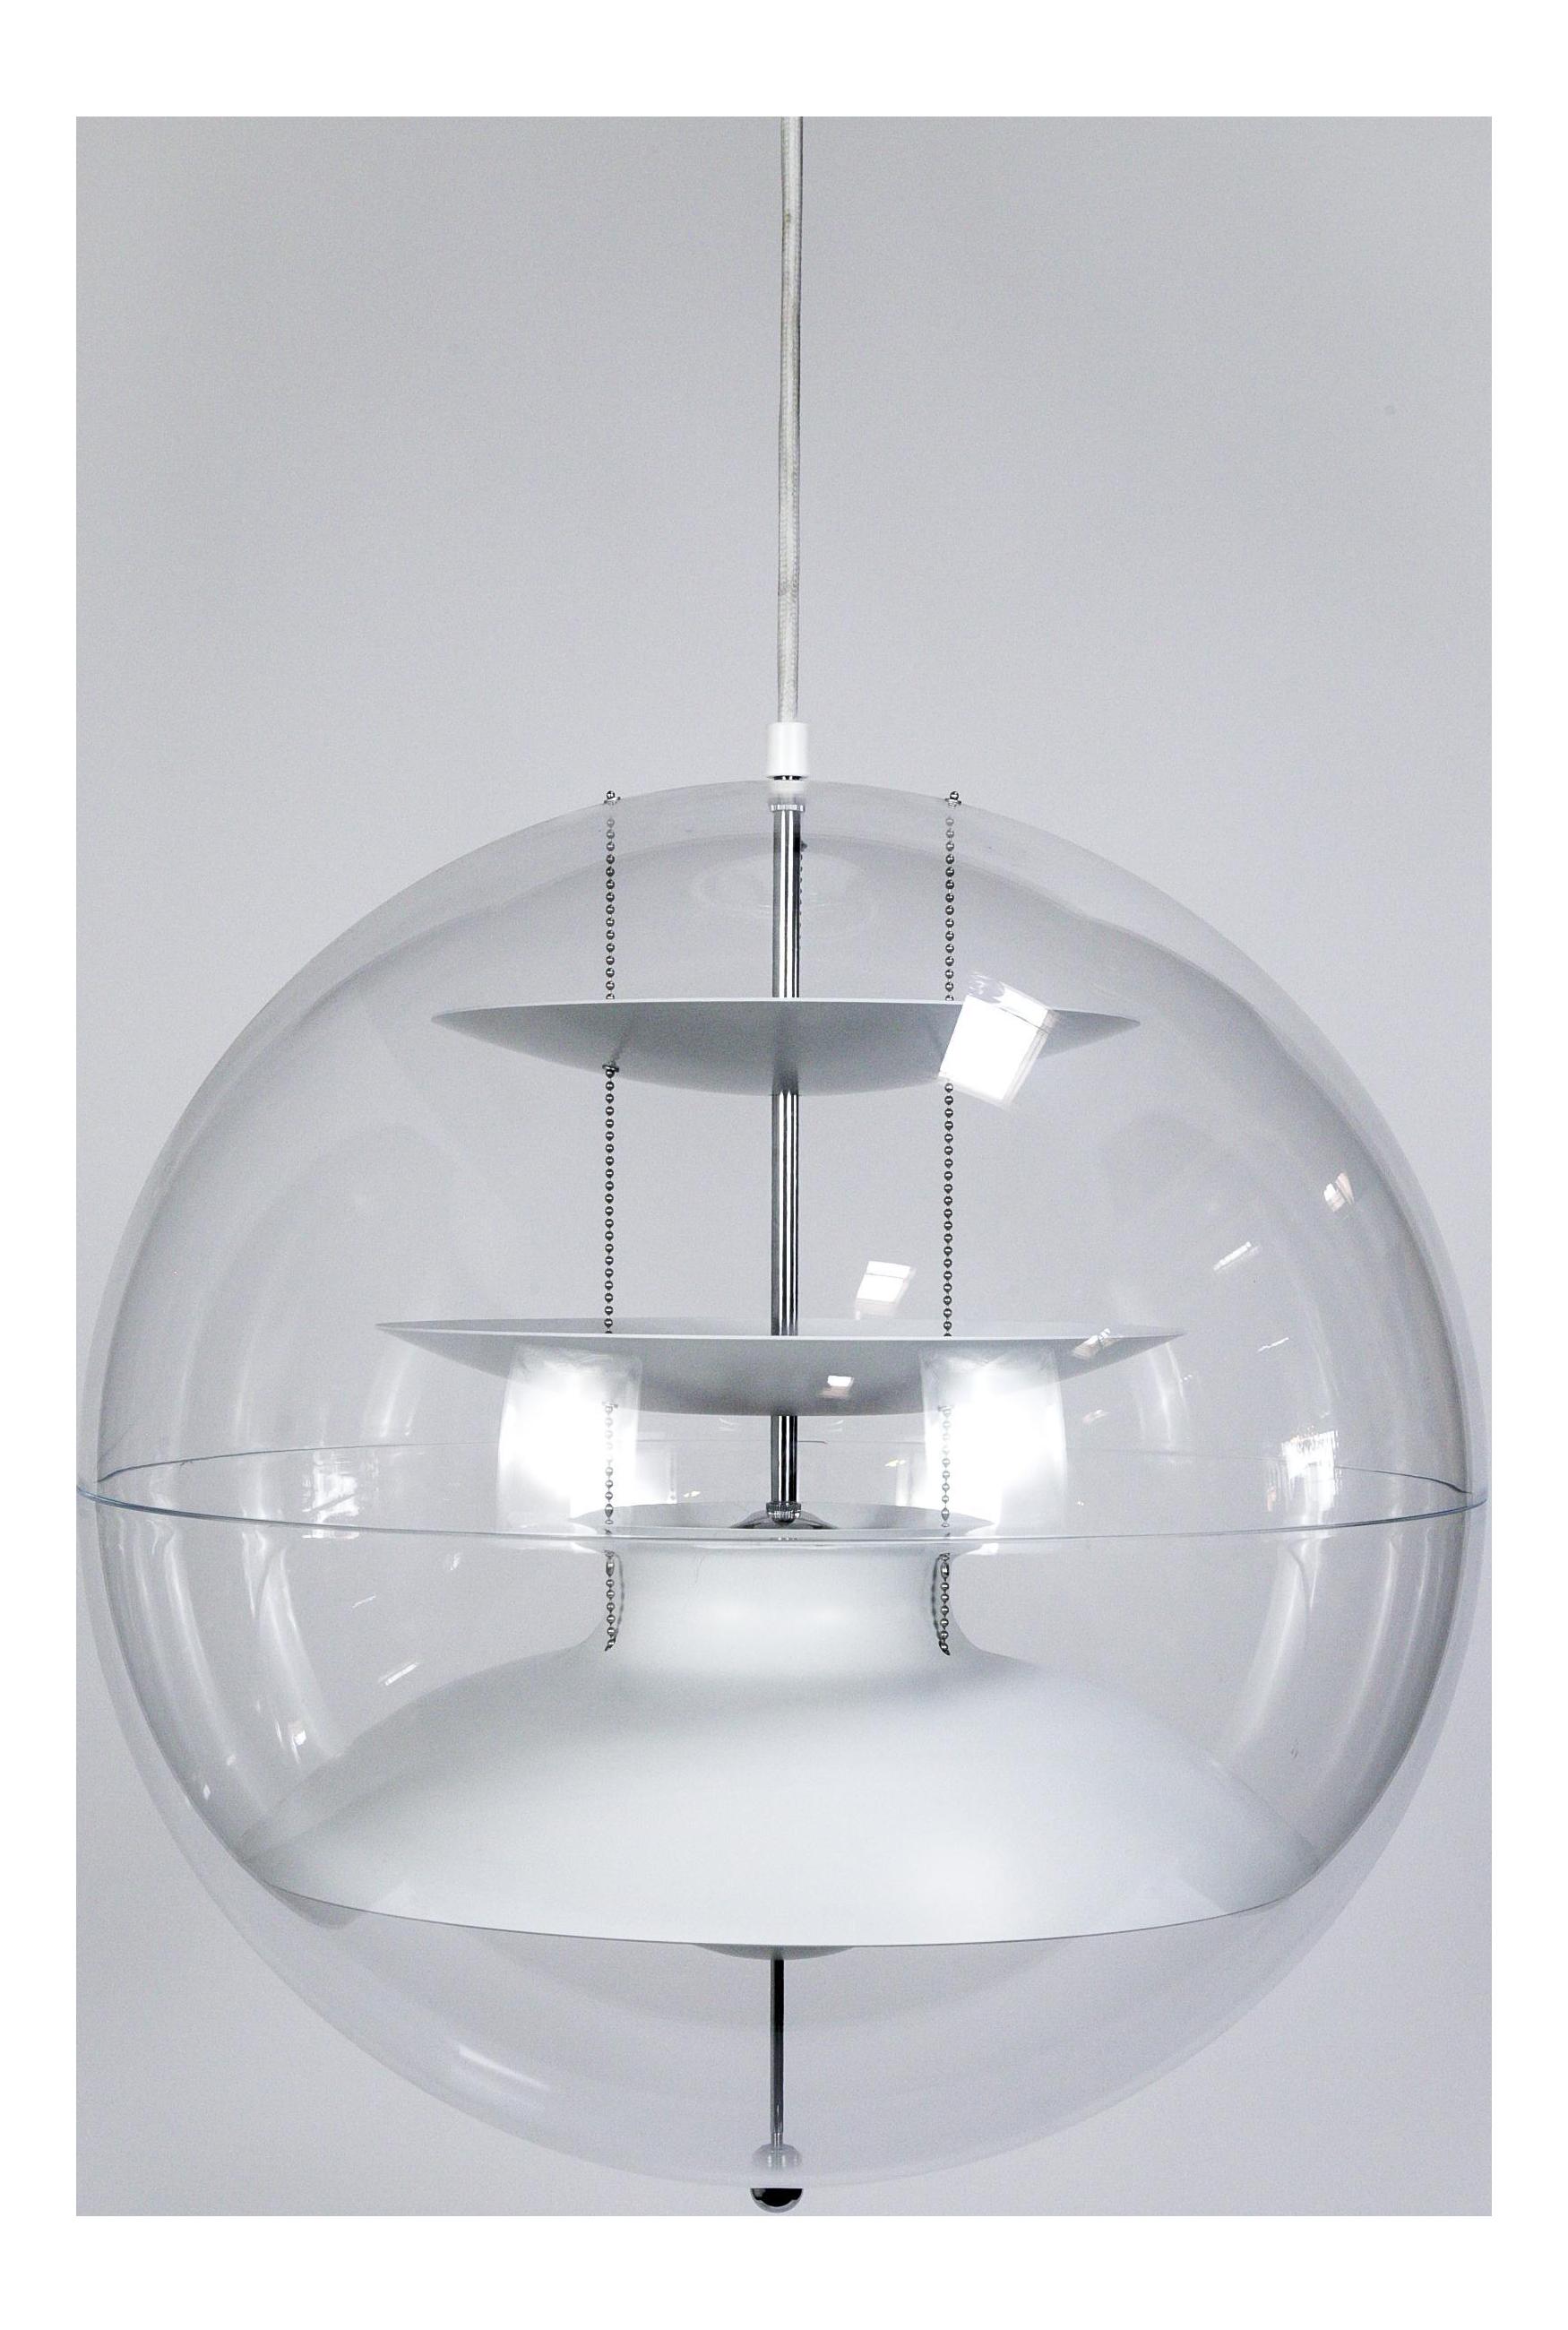 1970 Verpan Pendant Light  sc 1 st  Chairish & Gently Used Verpan Lighting | Up to 40% off at Chairish azcodes.com